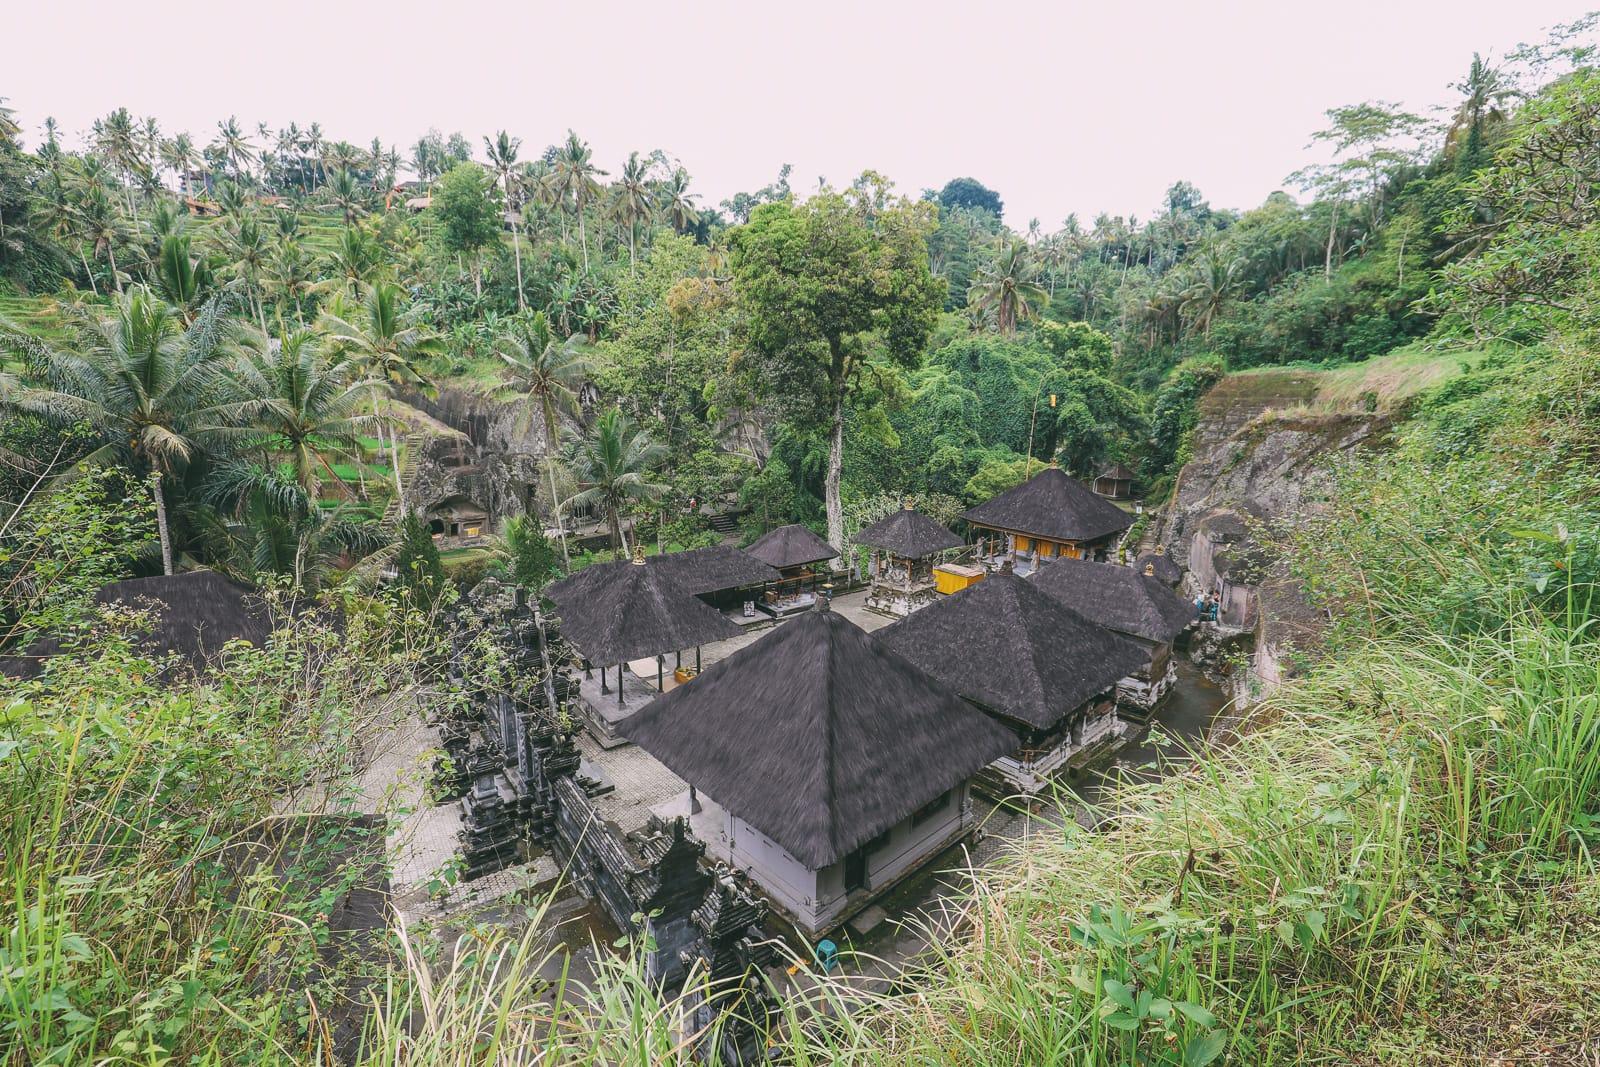 Bali Travel - Tegalalang Rice Terrace In Ubud And Gunung Kawi Temple (43)